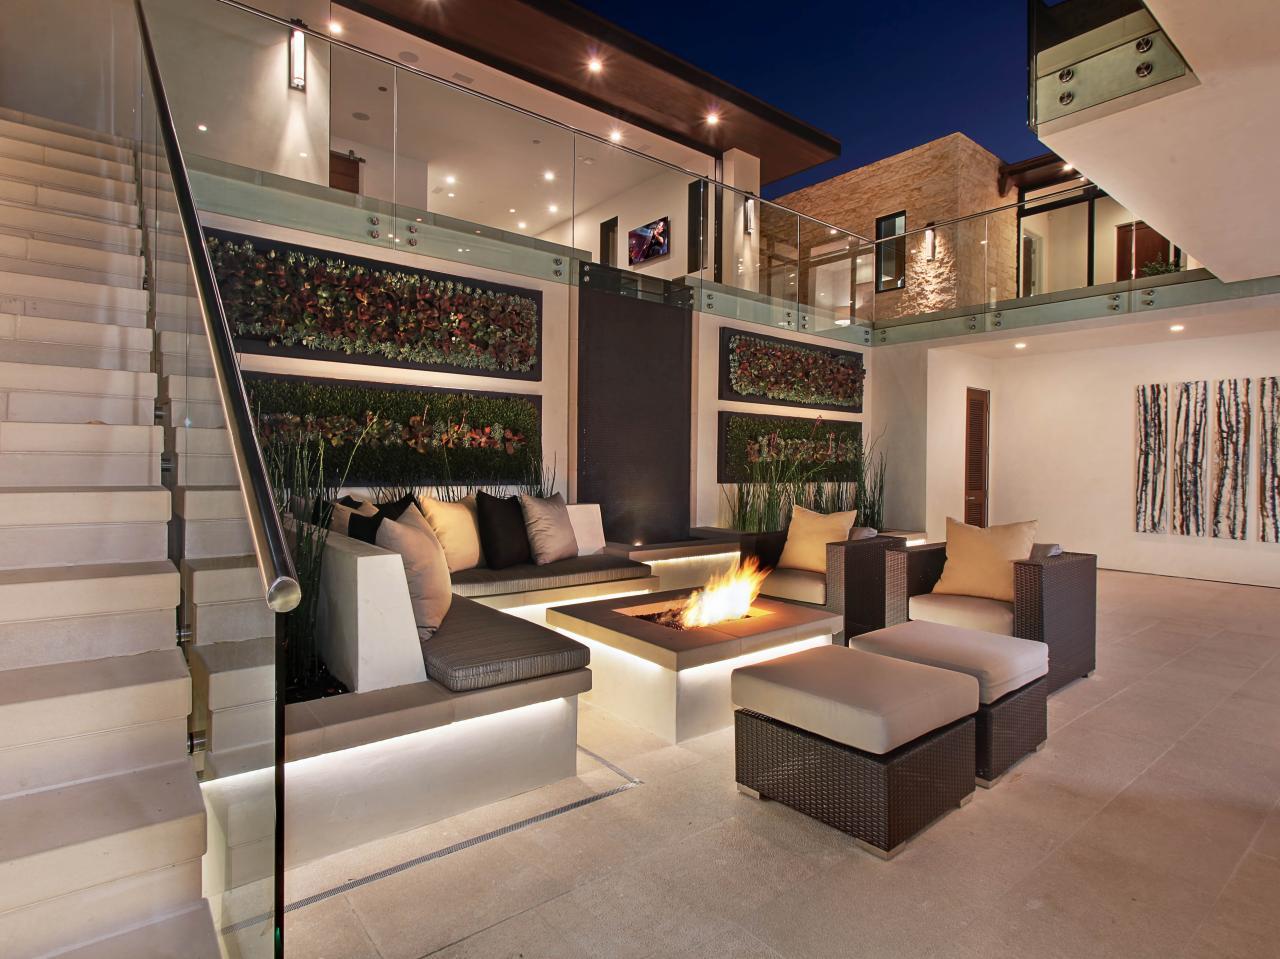 Fire Pit Design Ideas Outdoor Spaces Patio